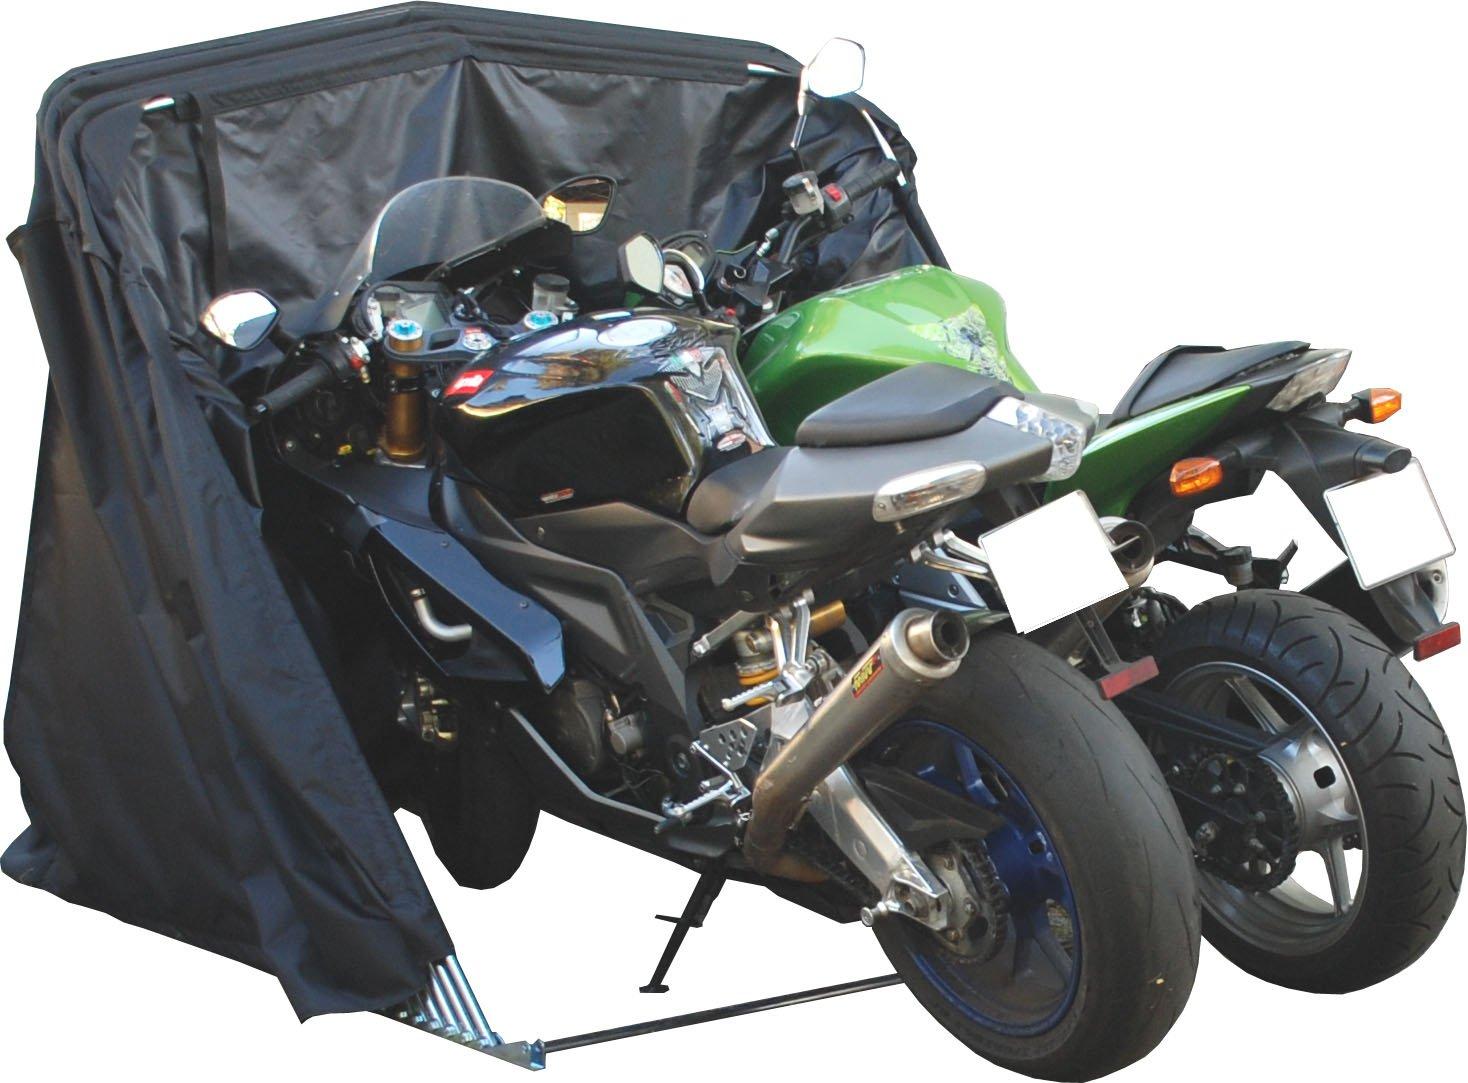 Frecce Garage pieghevole Garage Moto Scooter ciclomotore Garage Telo Tenda Nero XXL